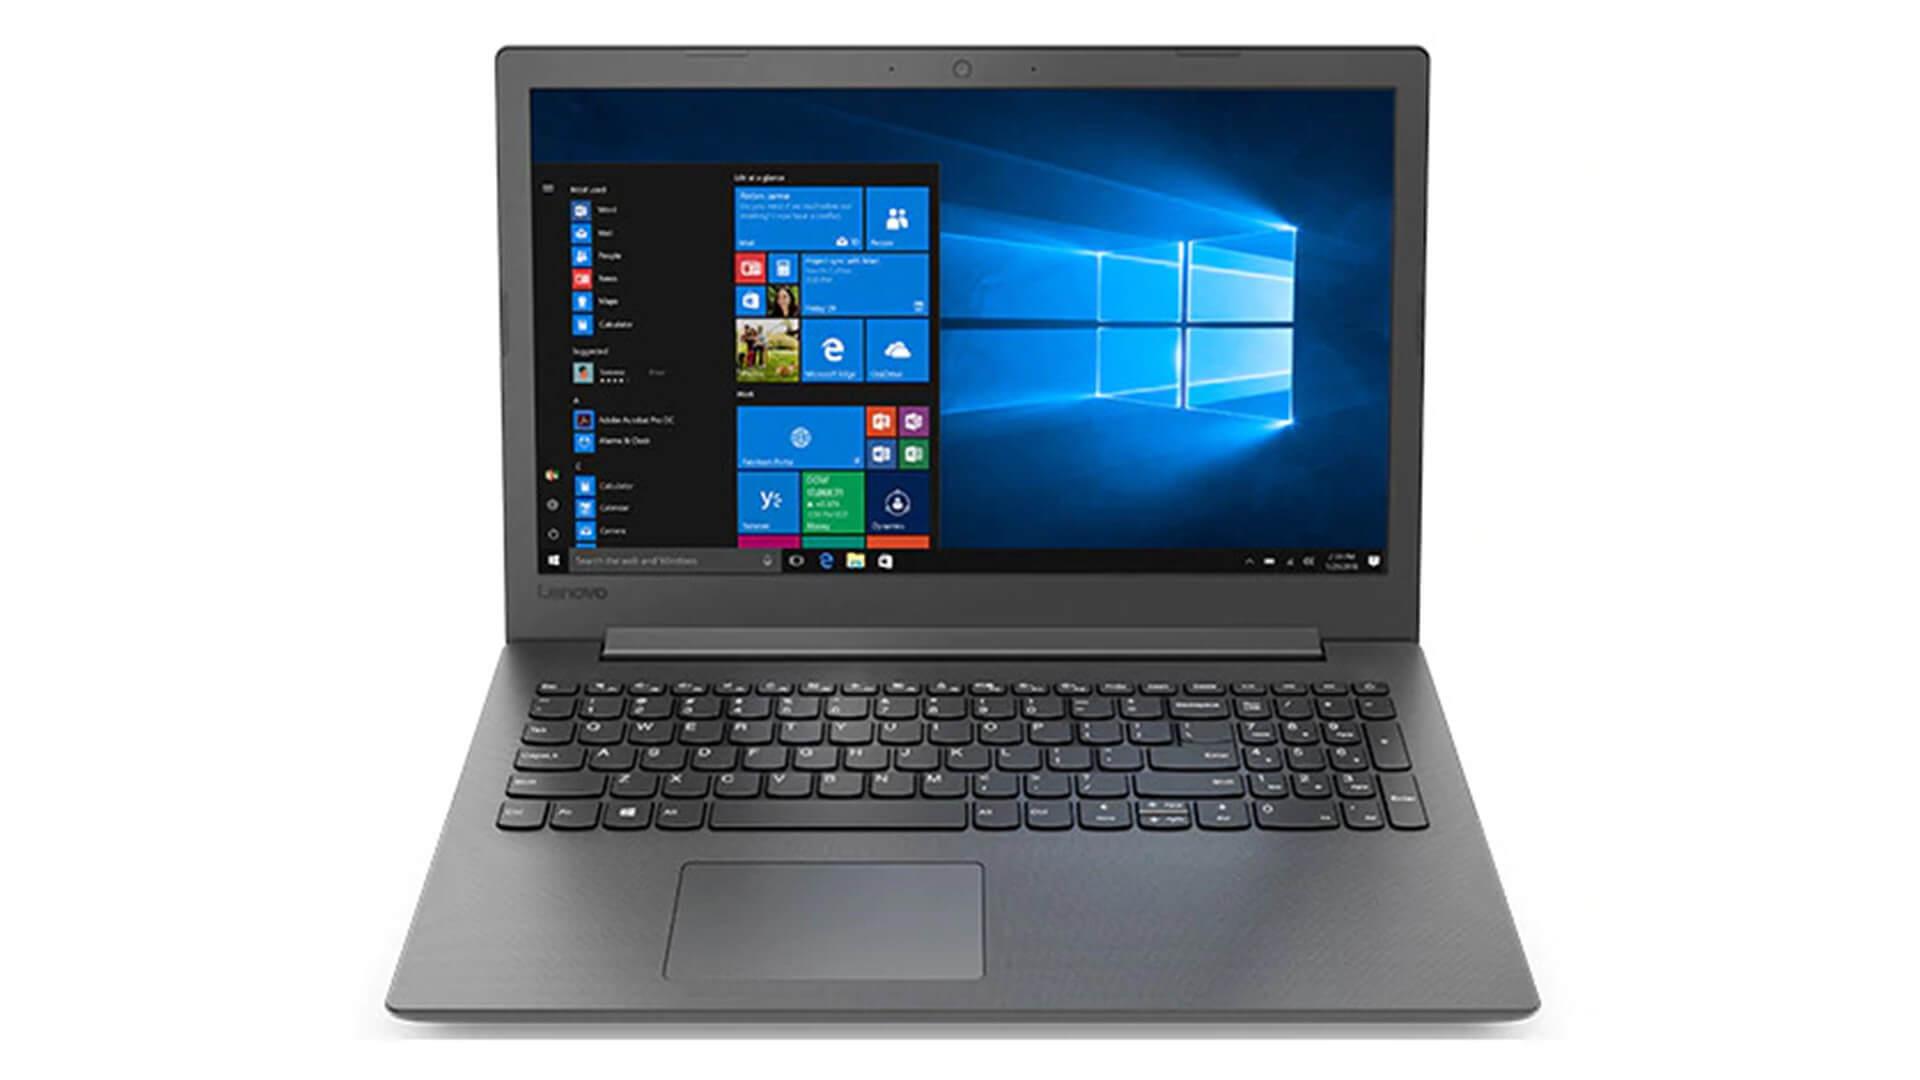 لپ تاپ ۱۵ اینچی لنوو مدل Ideapad 130 – CM